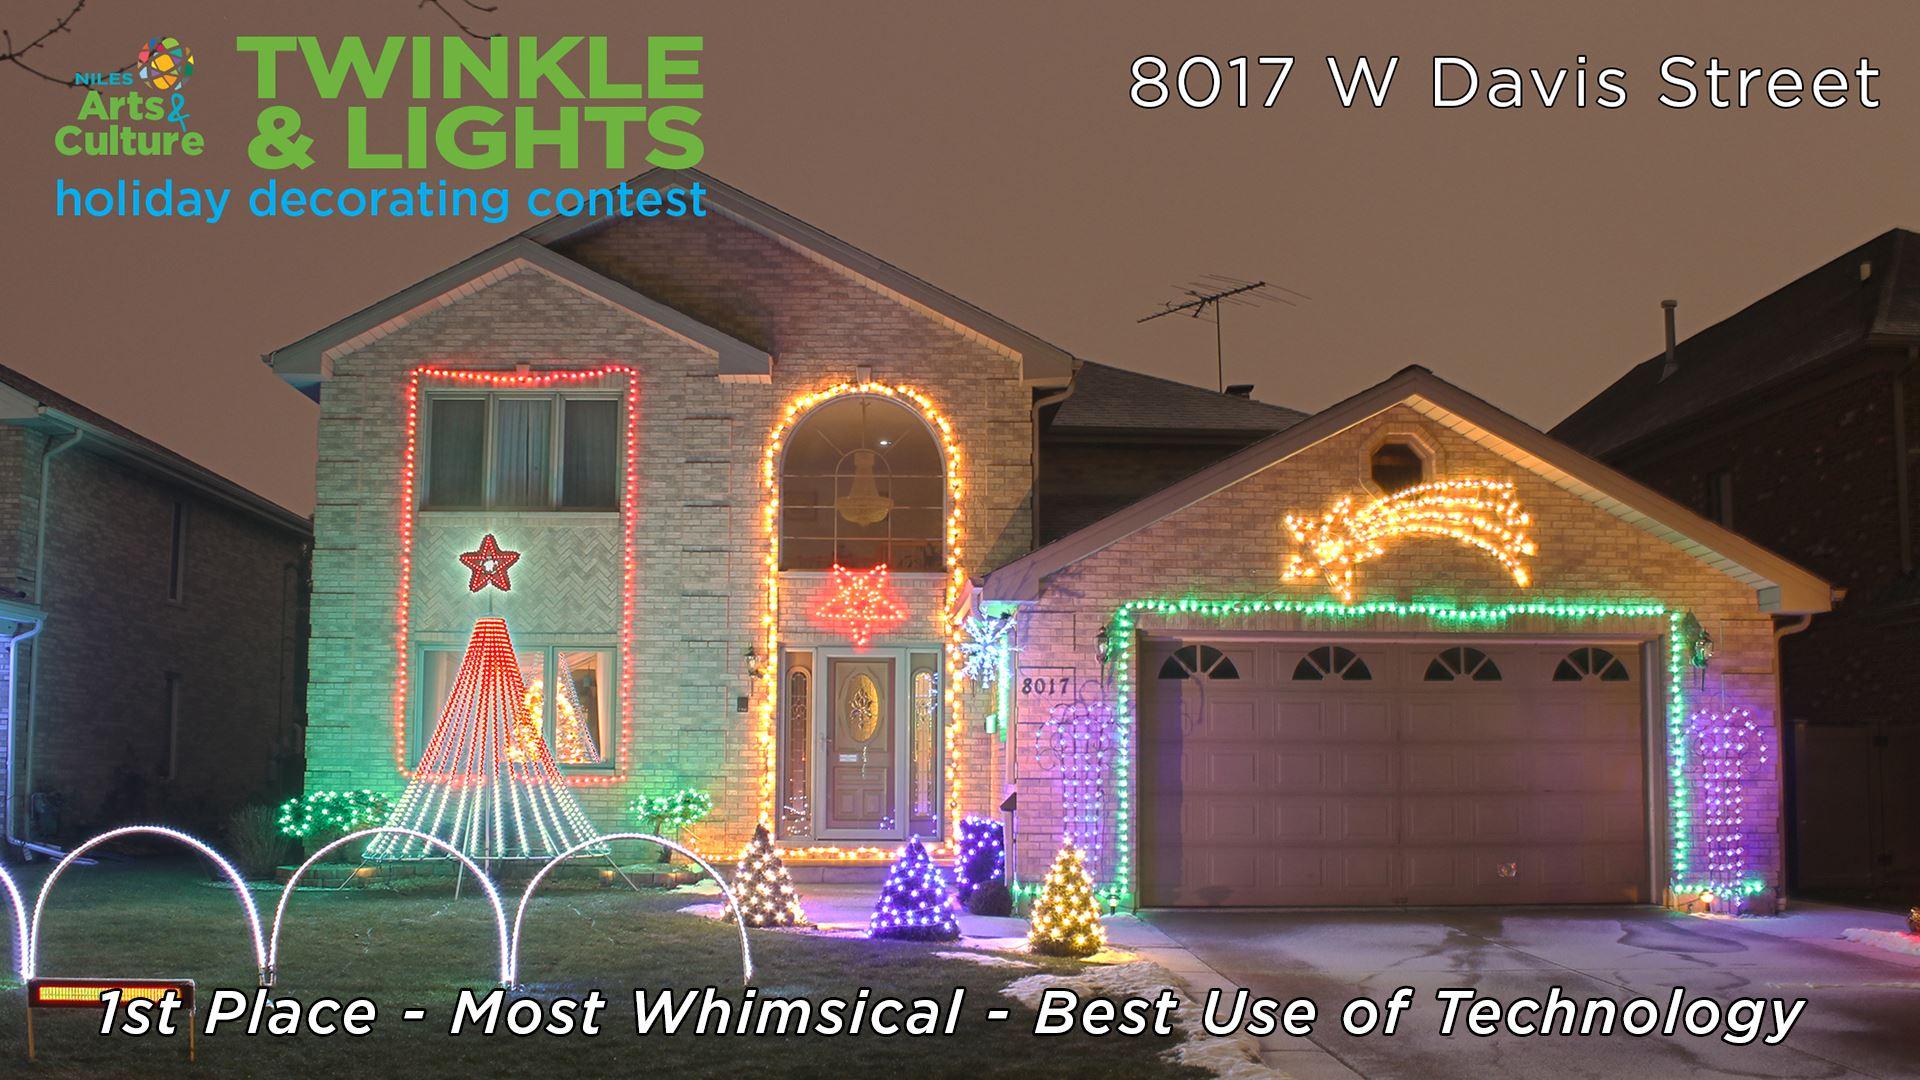 Twinkle & Lights\